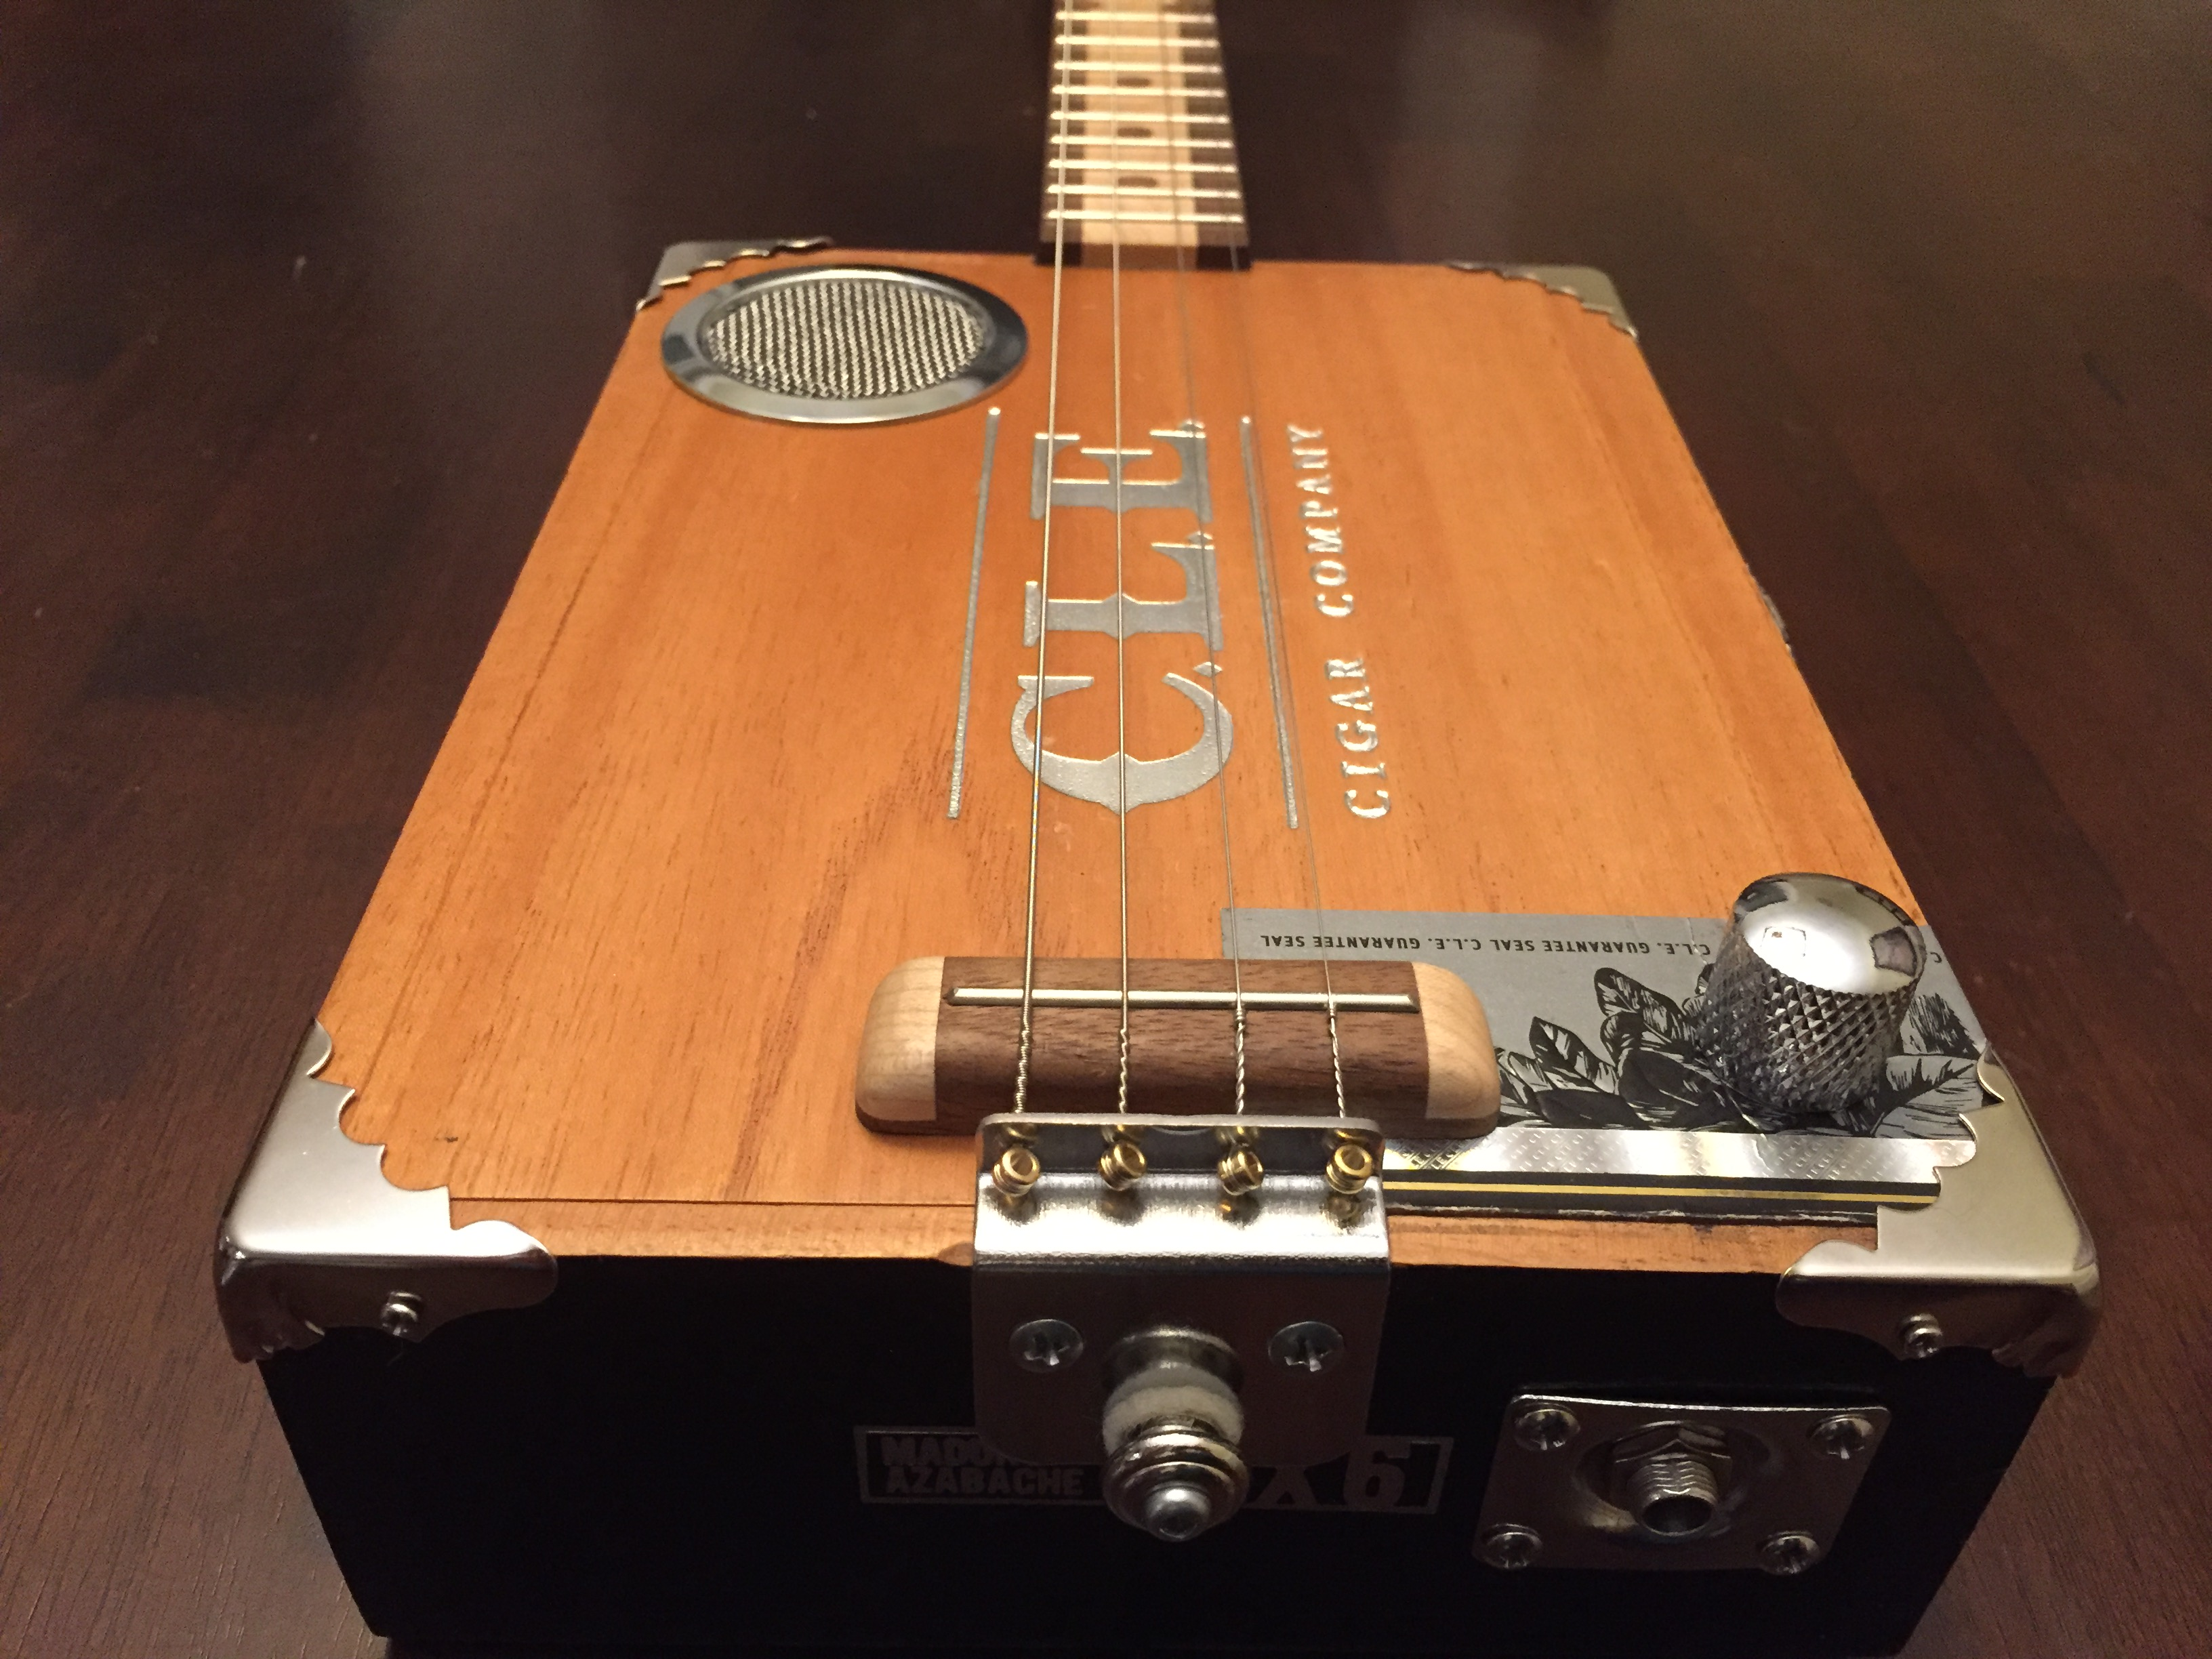 CLE Cigar Box Guitar Build - Corner details, custom bridge and sound hole cover